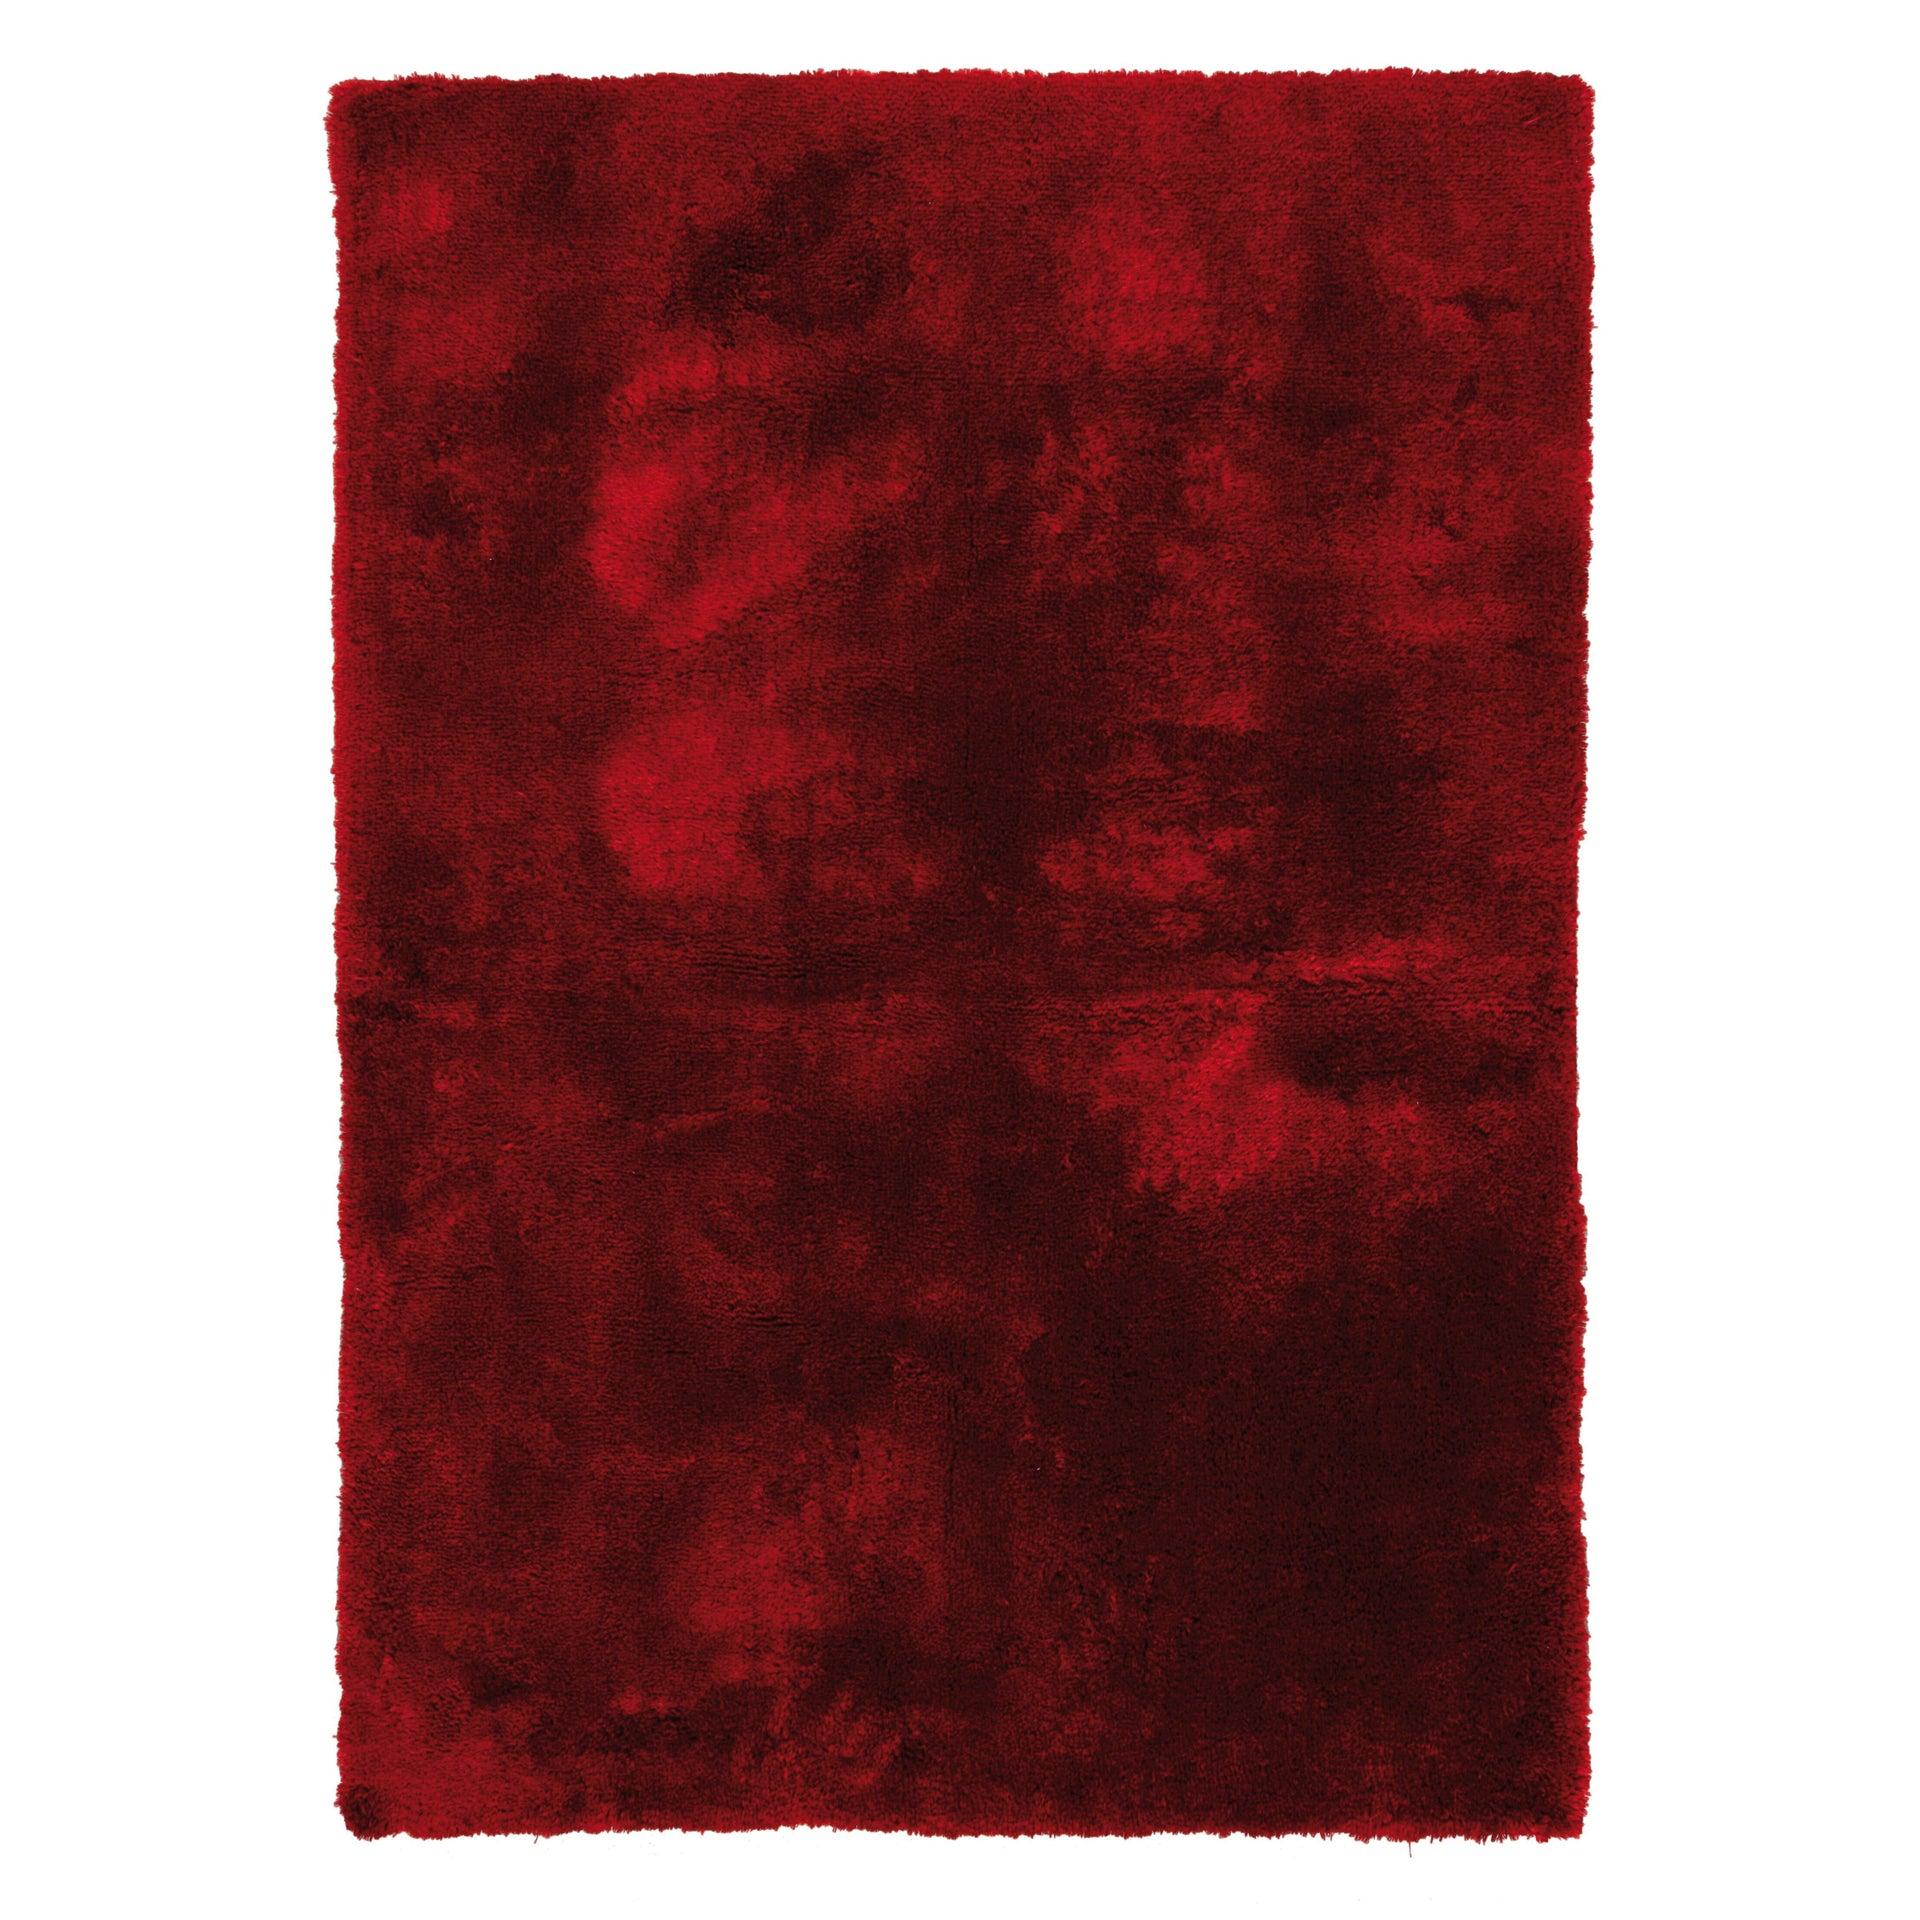 Tappeto Shaggy coccole , rosso, 120x170 - 9